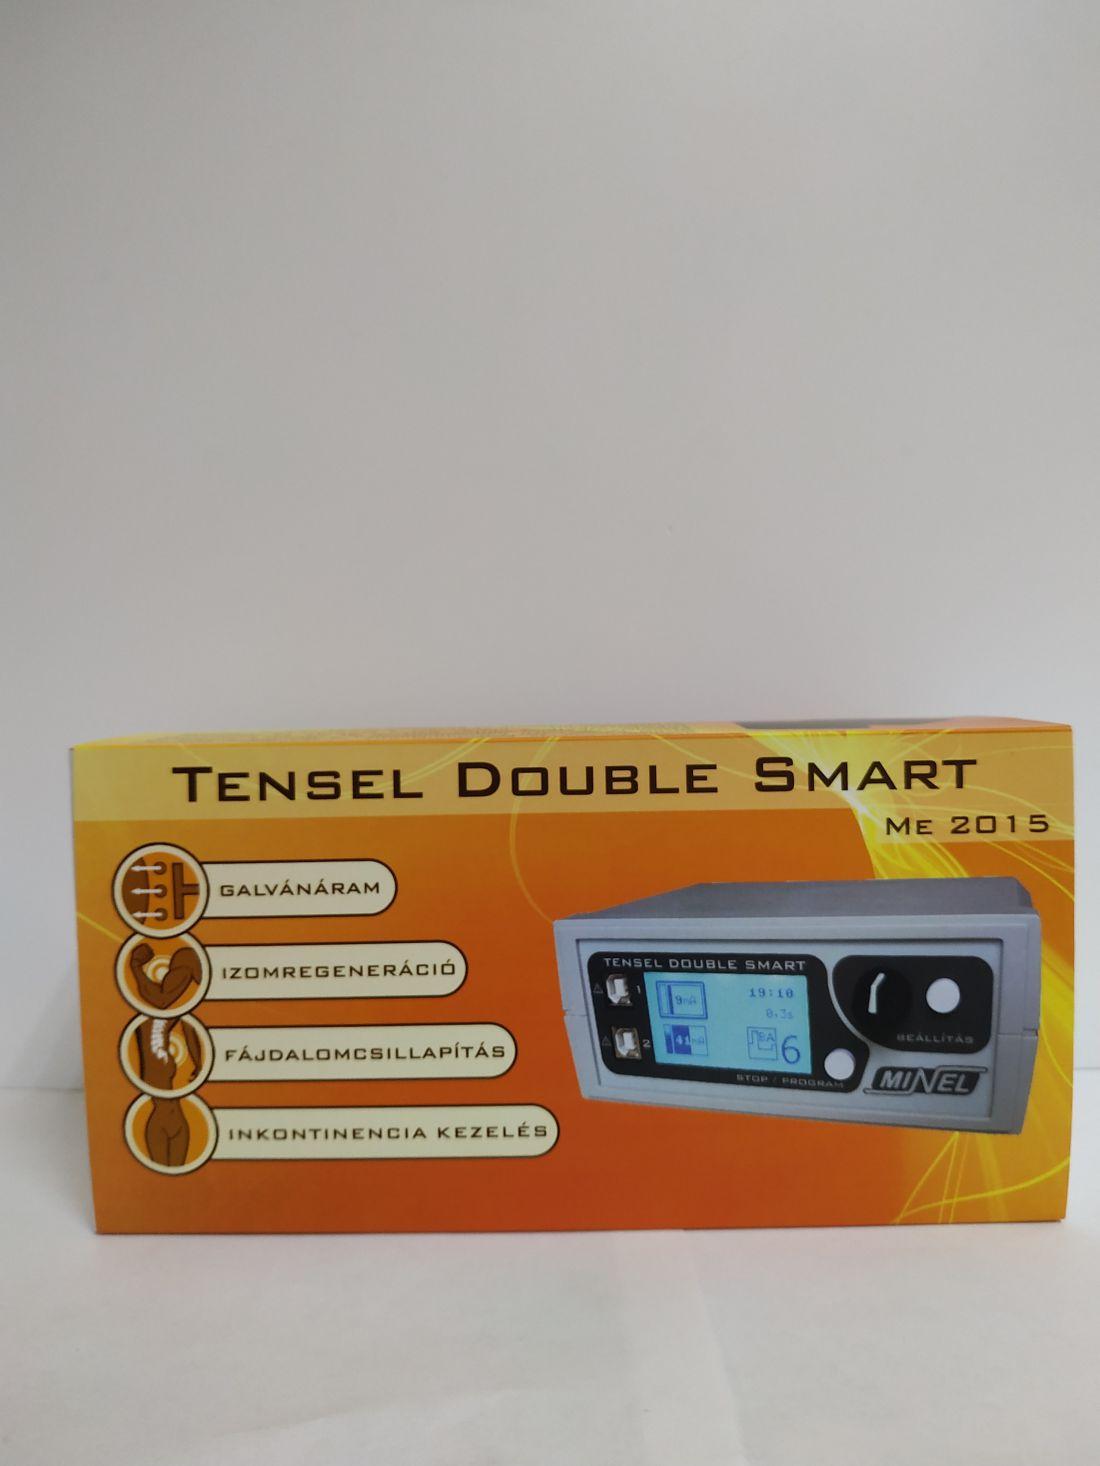 Tensel Me 2015 Double Smart Elektromos izom stimulátor